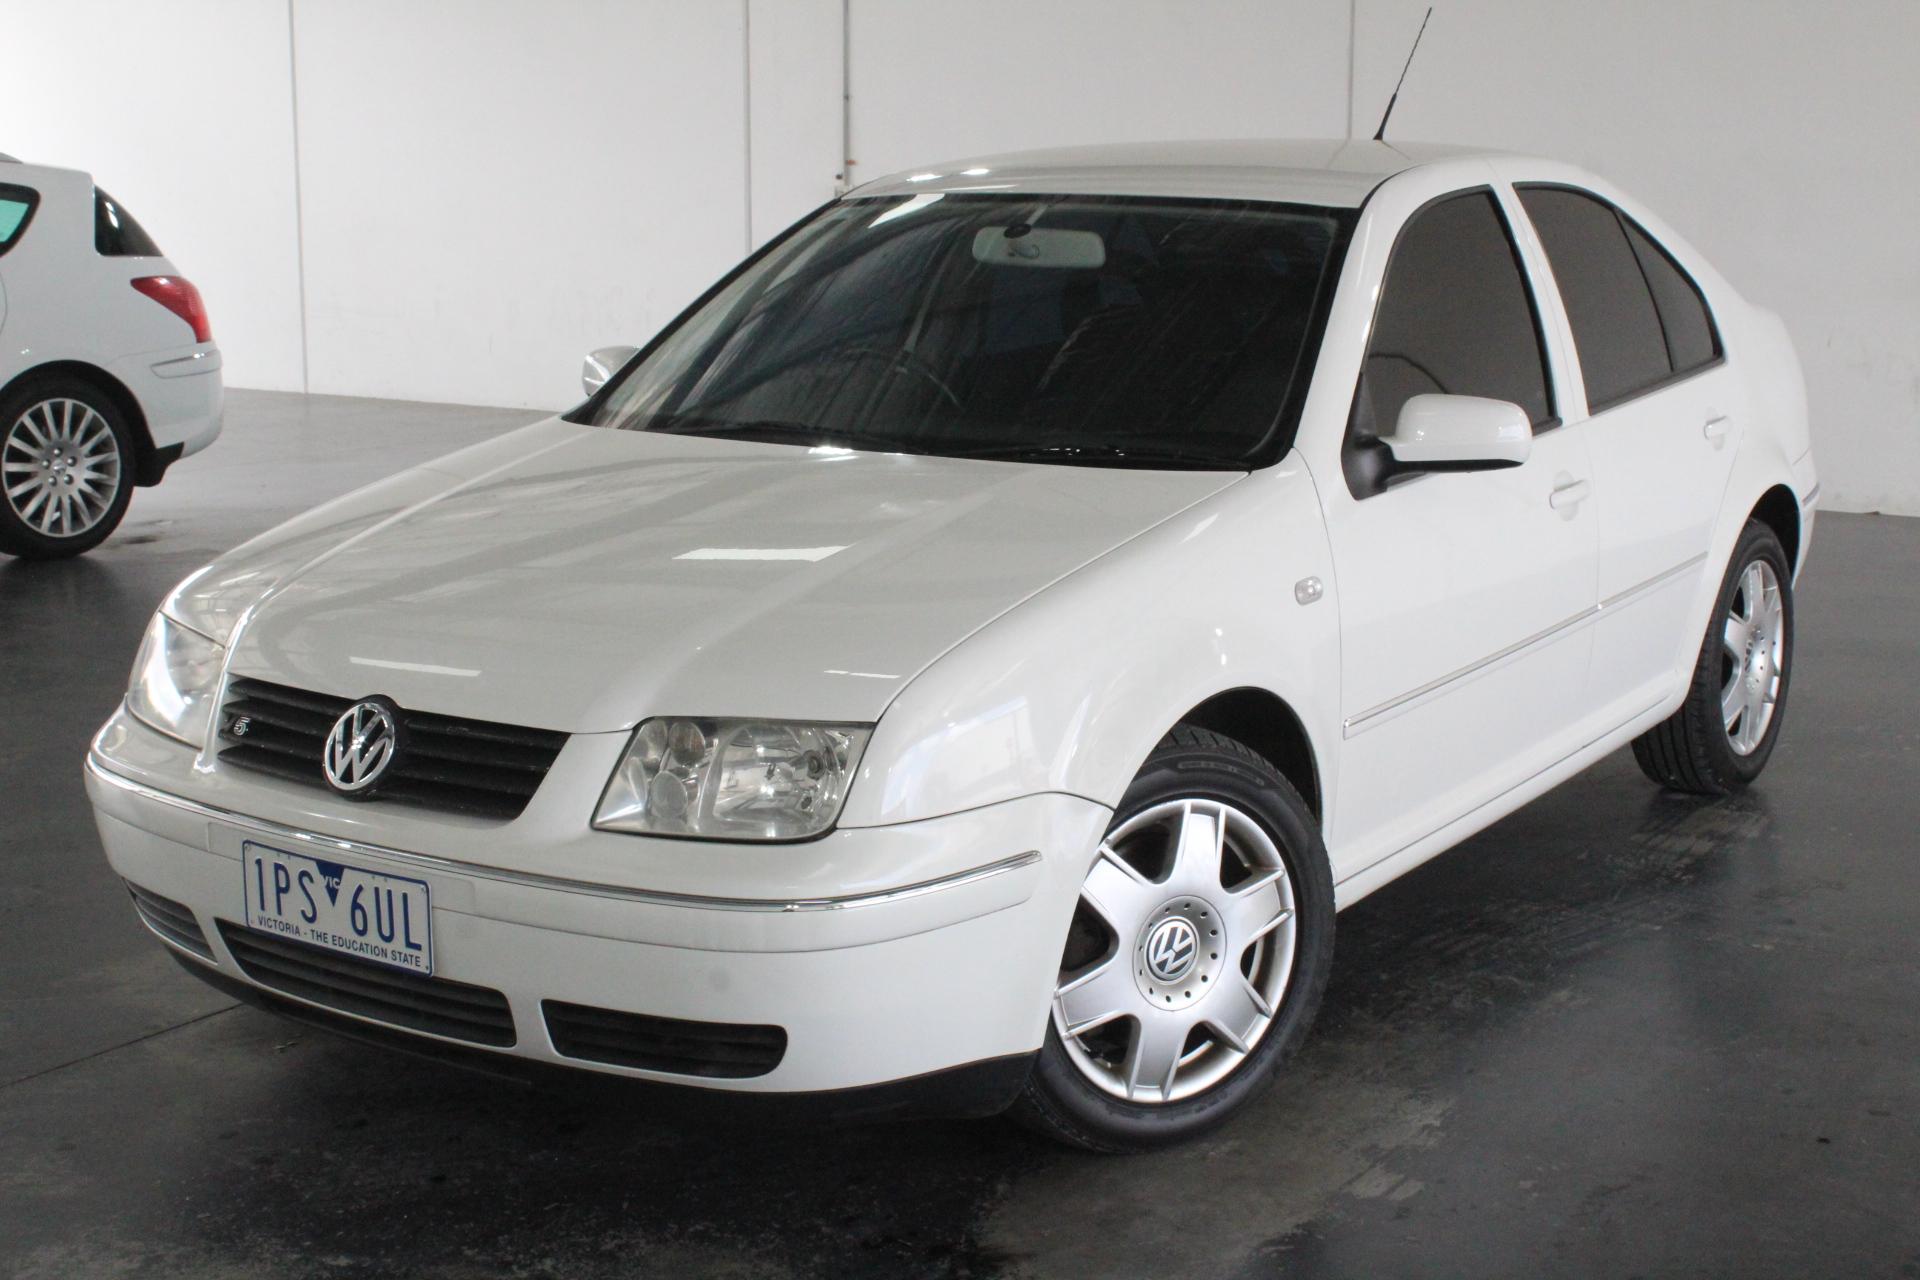 2001 Volkswagen Bora 2.3L V5 1J Automatic Sedan